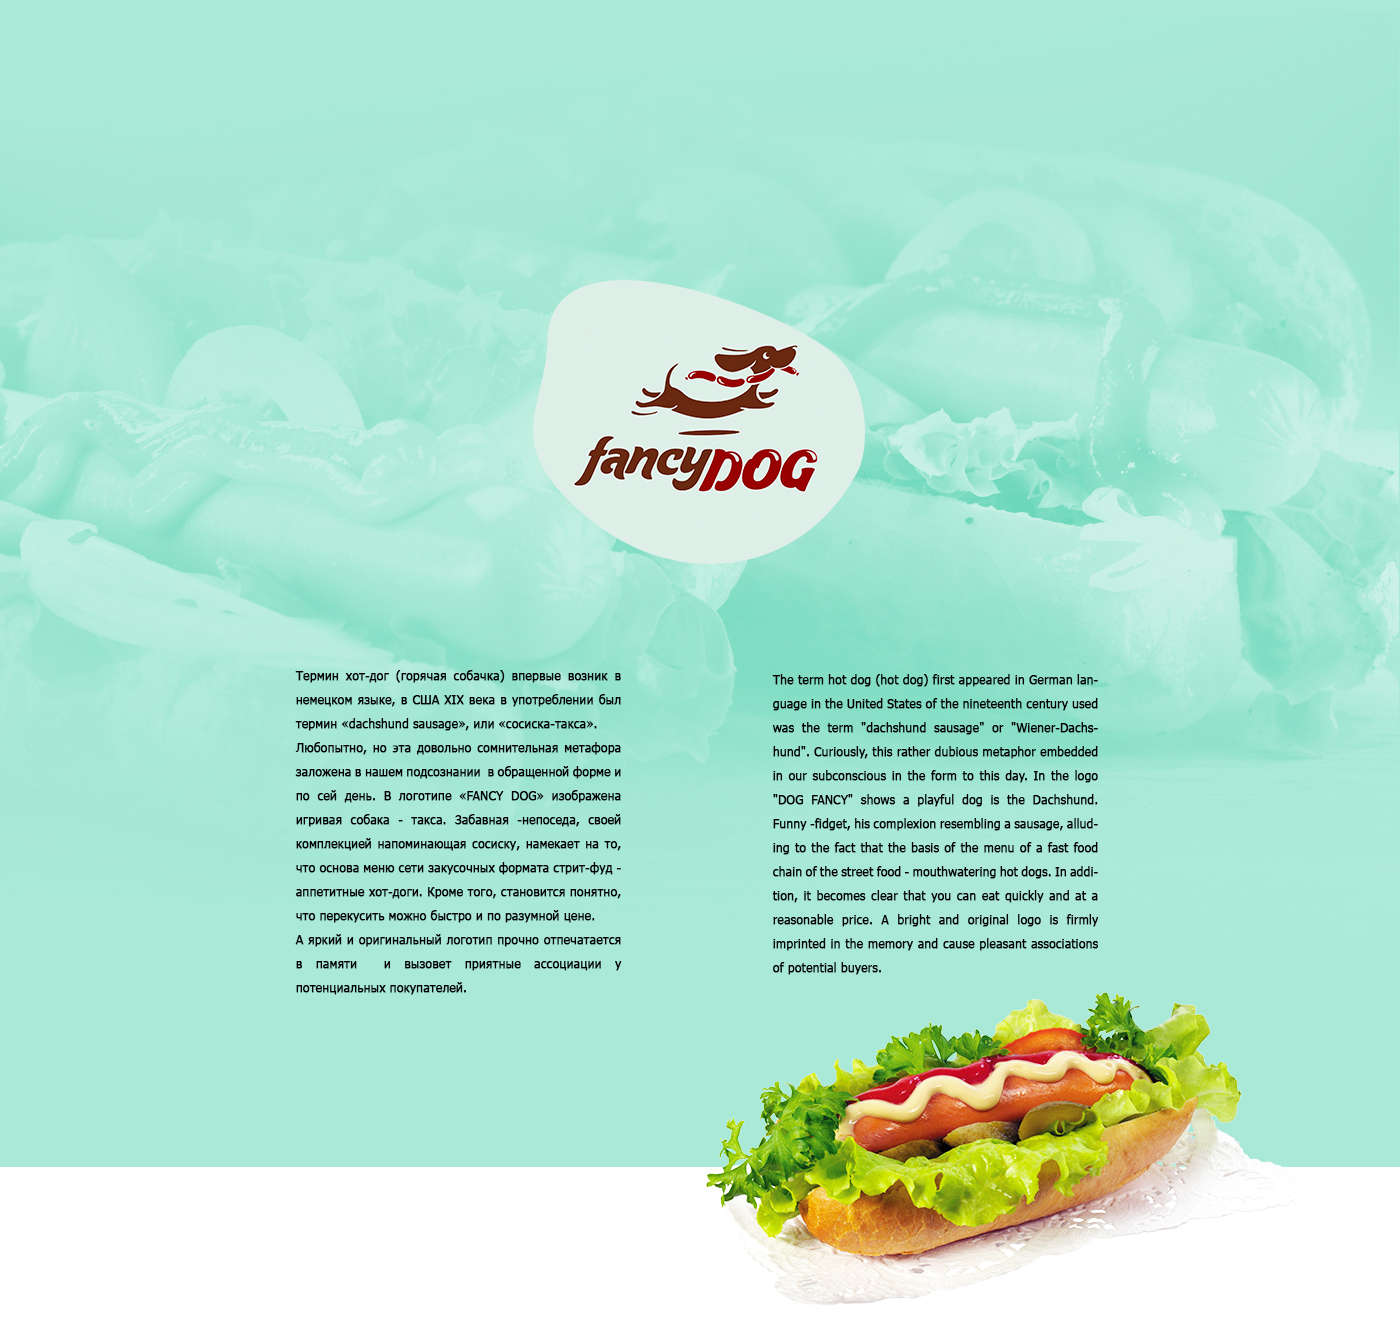 fastfood hot dog burger dog